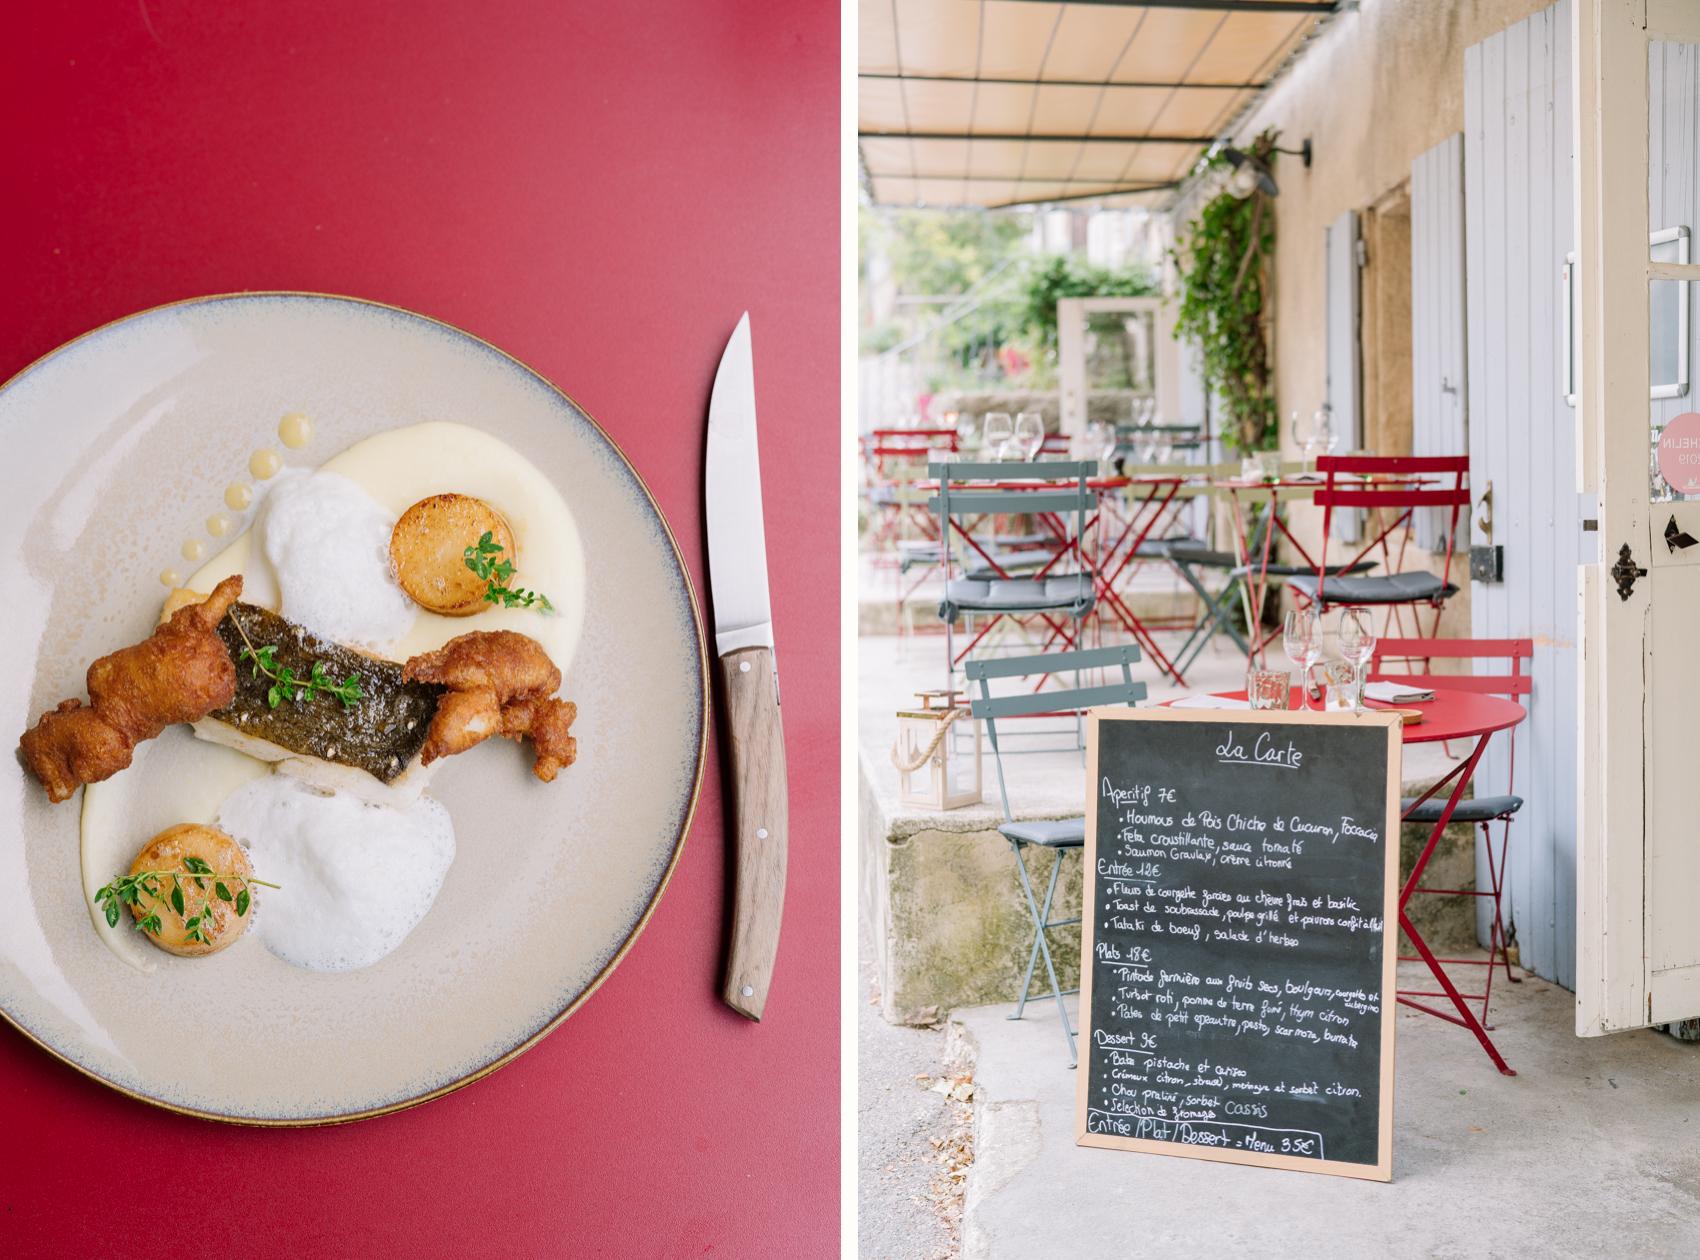 TRAVEL-Photography-lifestyle-provence-hotel-restaurant-food-Clara-Tuma_002B.jpg